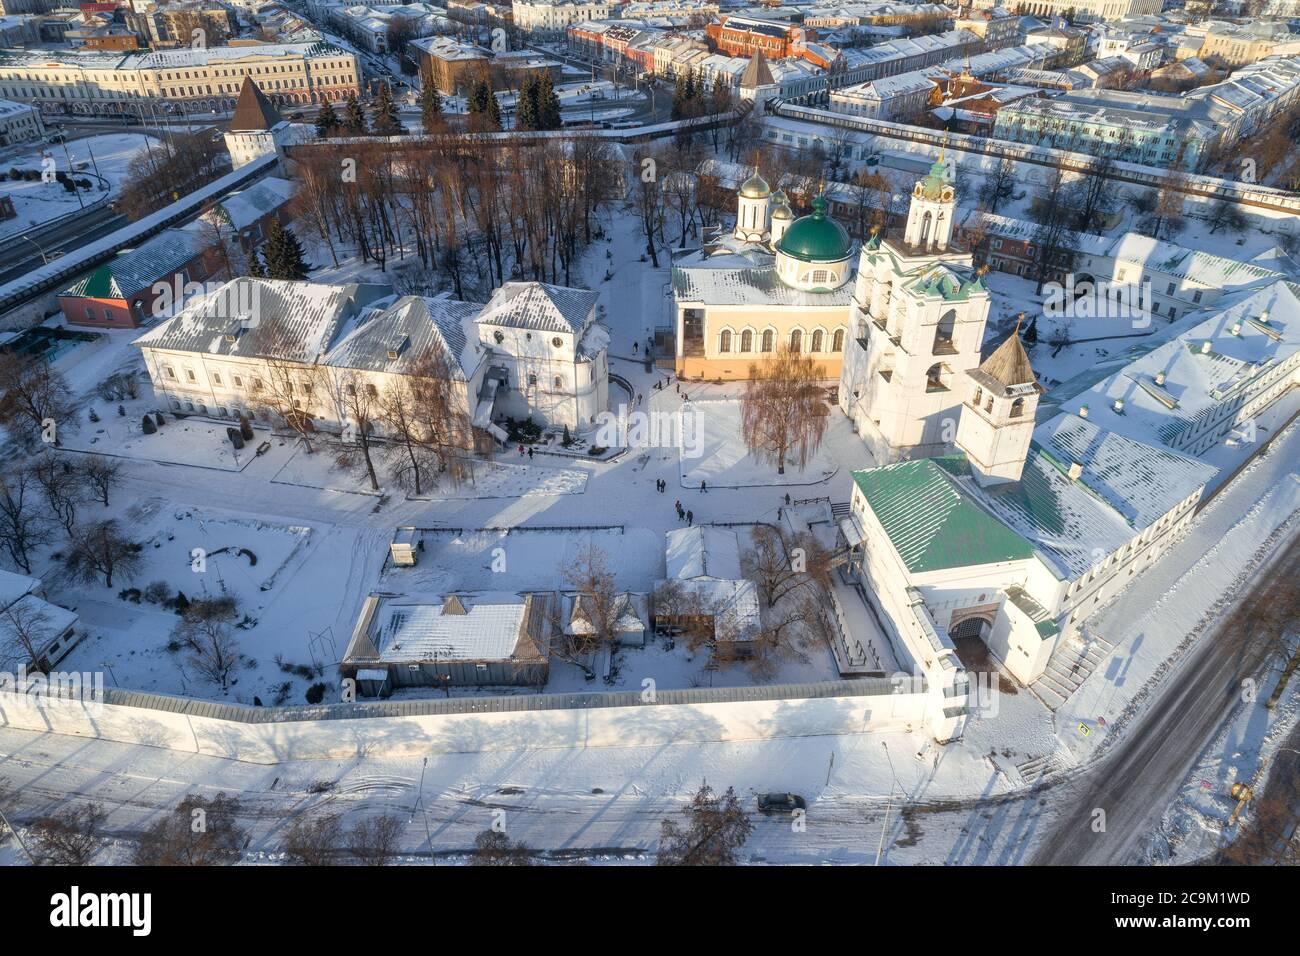 Über dem Spaso-Preobraschenski Kloster am Januartag (Luftaufnahme). Jaroslawl, Goldener Ring Russlands Stockfoto